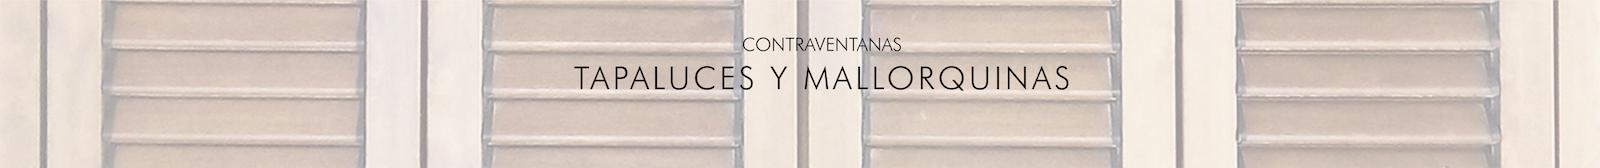 Contraventanas Tapaluces y Mallorquinas PVC